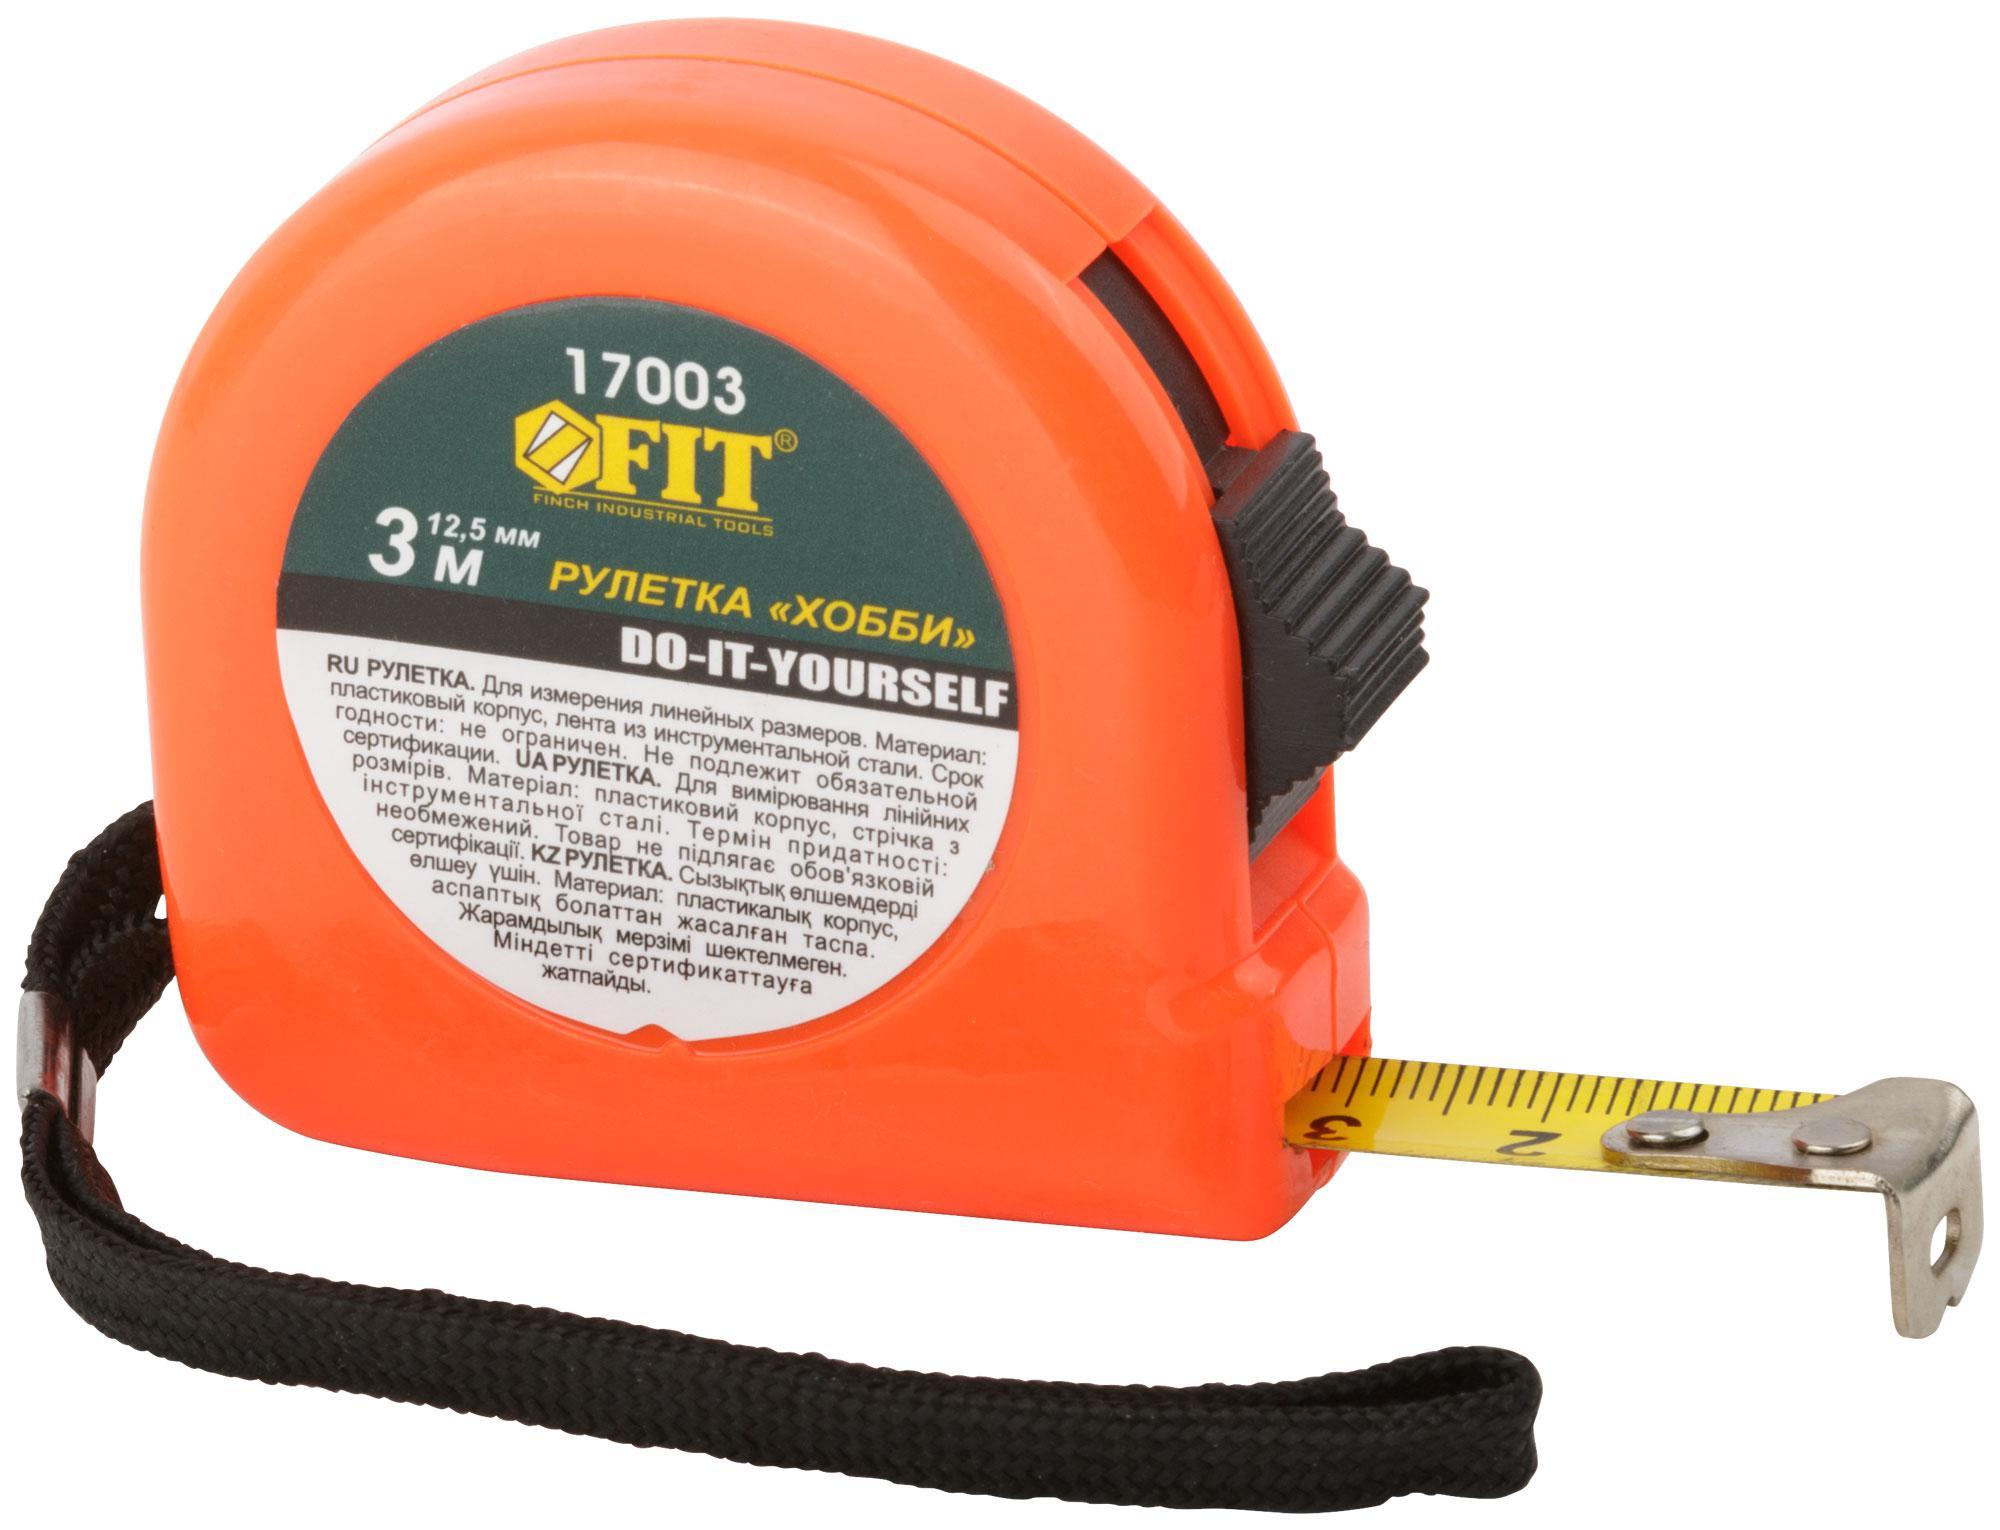 Рулетка Fit 17003